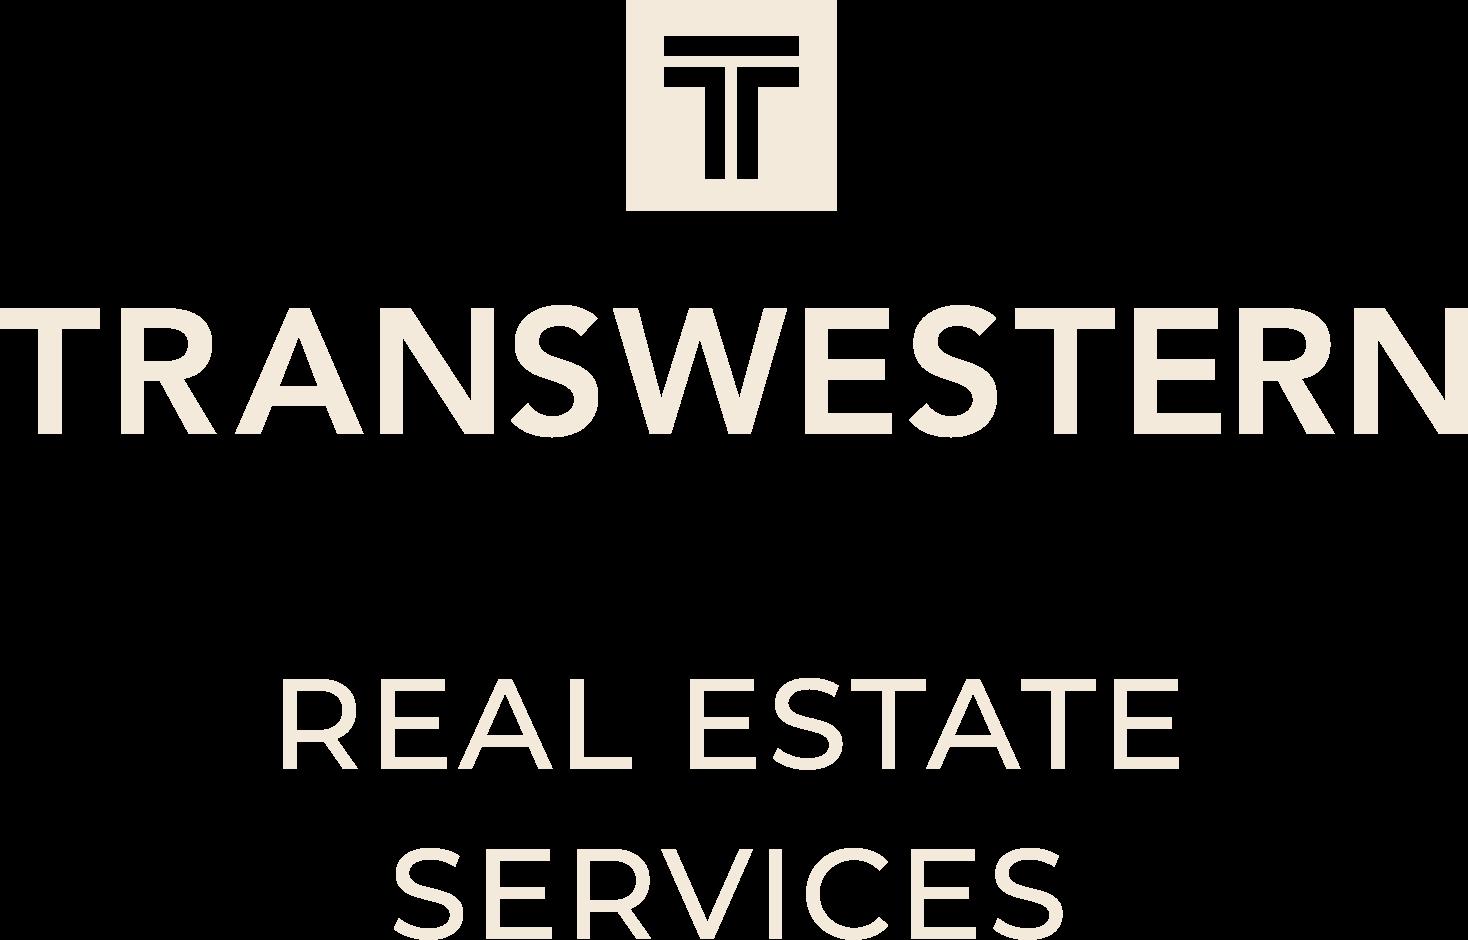 Transwestern Real Estate Services logo